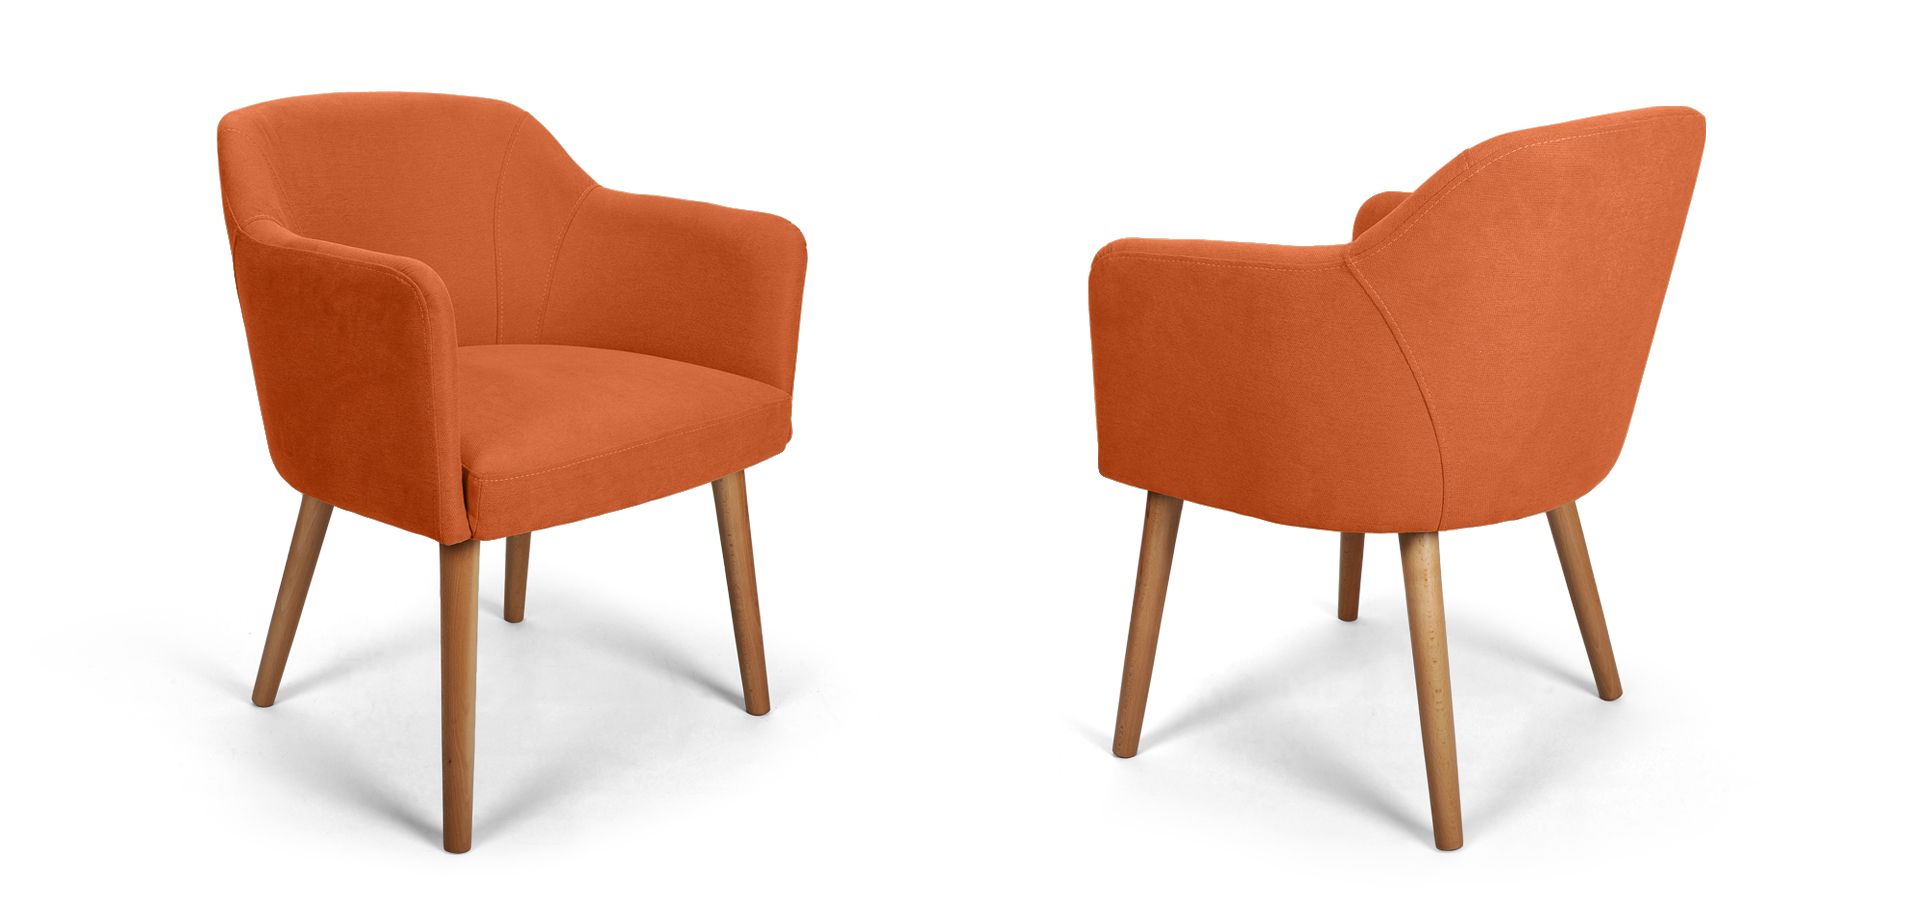 sofia-scaun-08.jpg